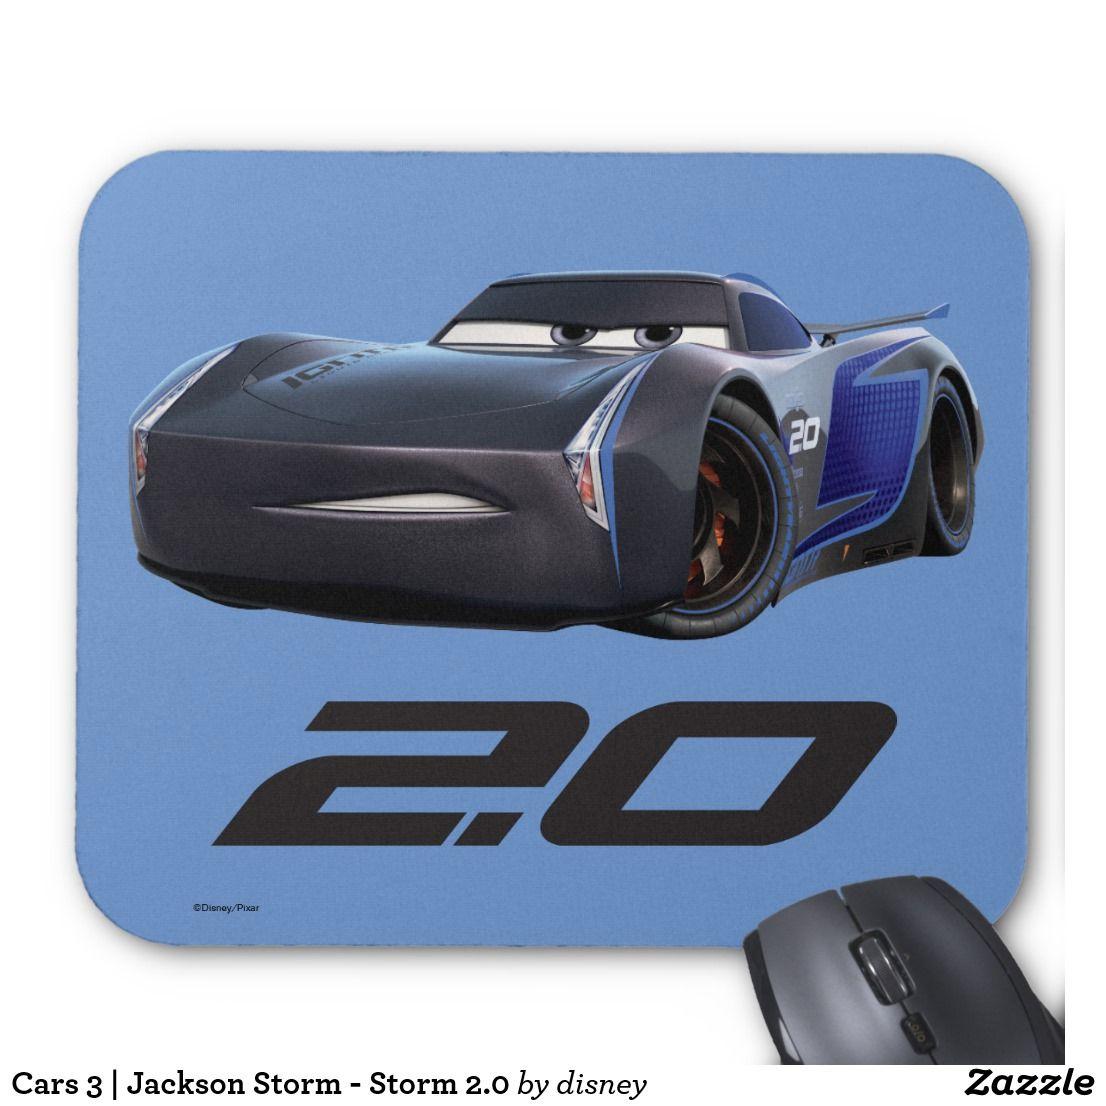 cars 3 jackson storm storm 2 0 mouse pad. Black Bedroom Furniture Sets. Home Design Ideas